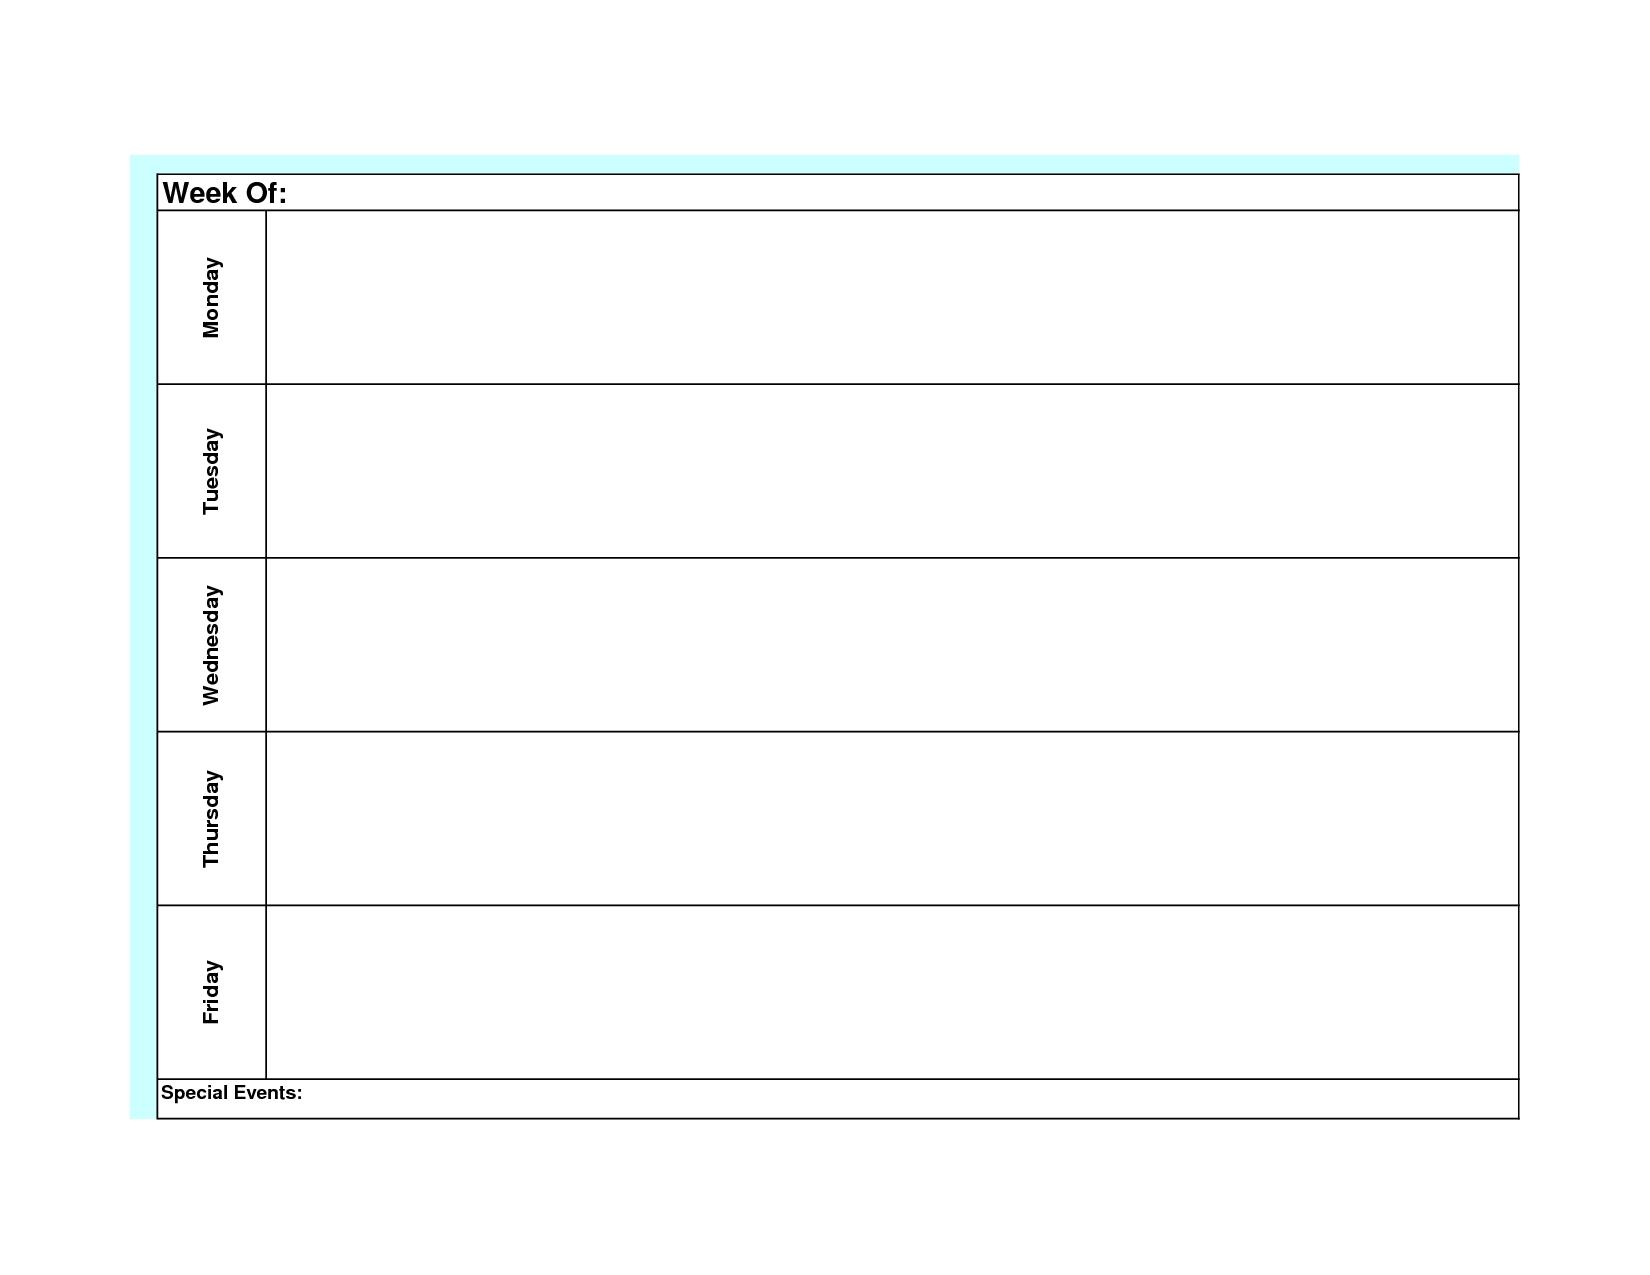 Blank Weekly Calendar Template Monday Friday | Planner-Monday To Friday Monthly Calendar